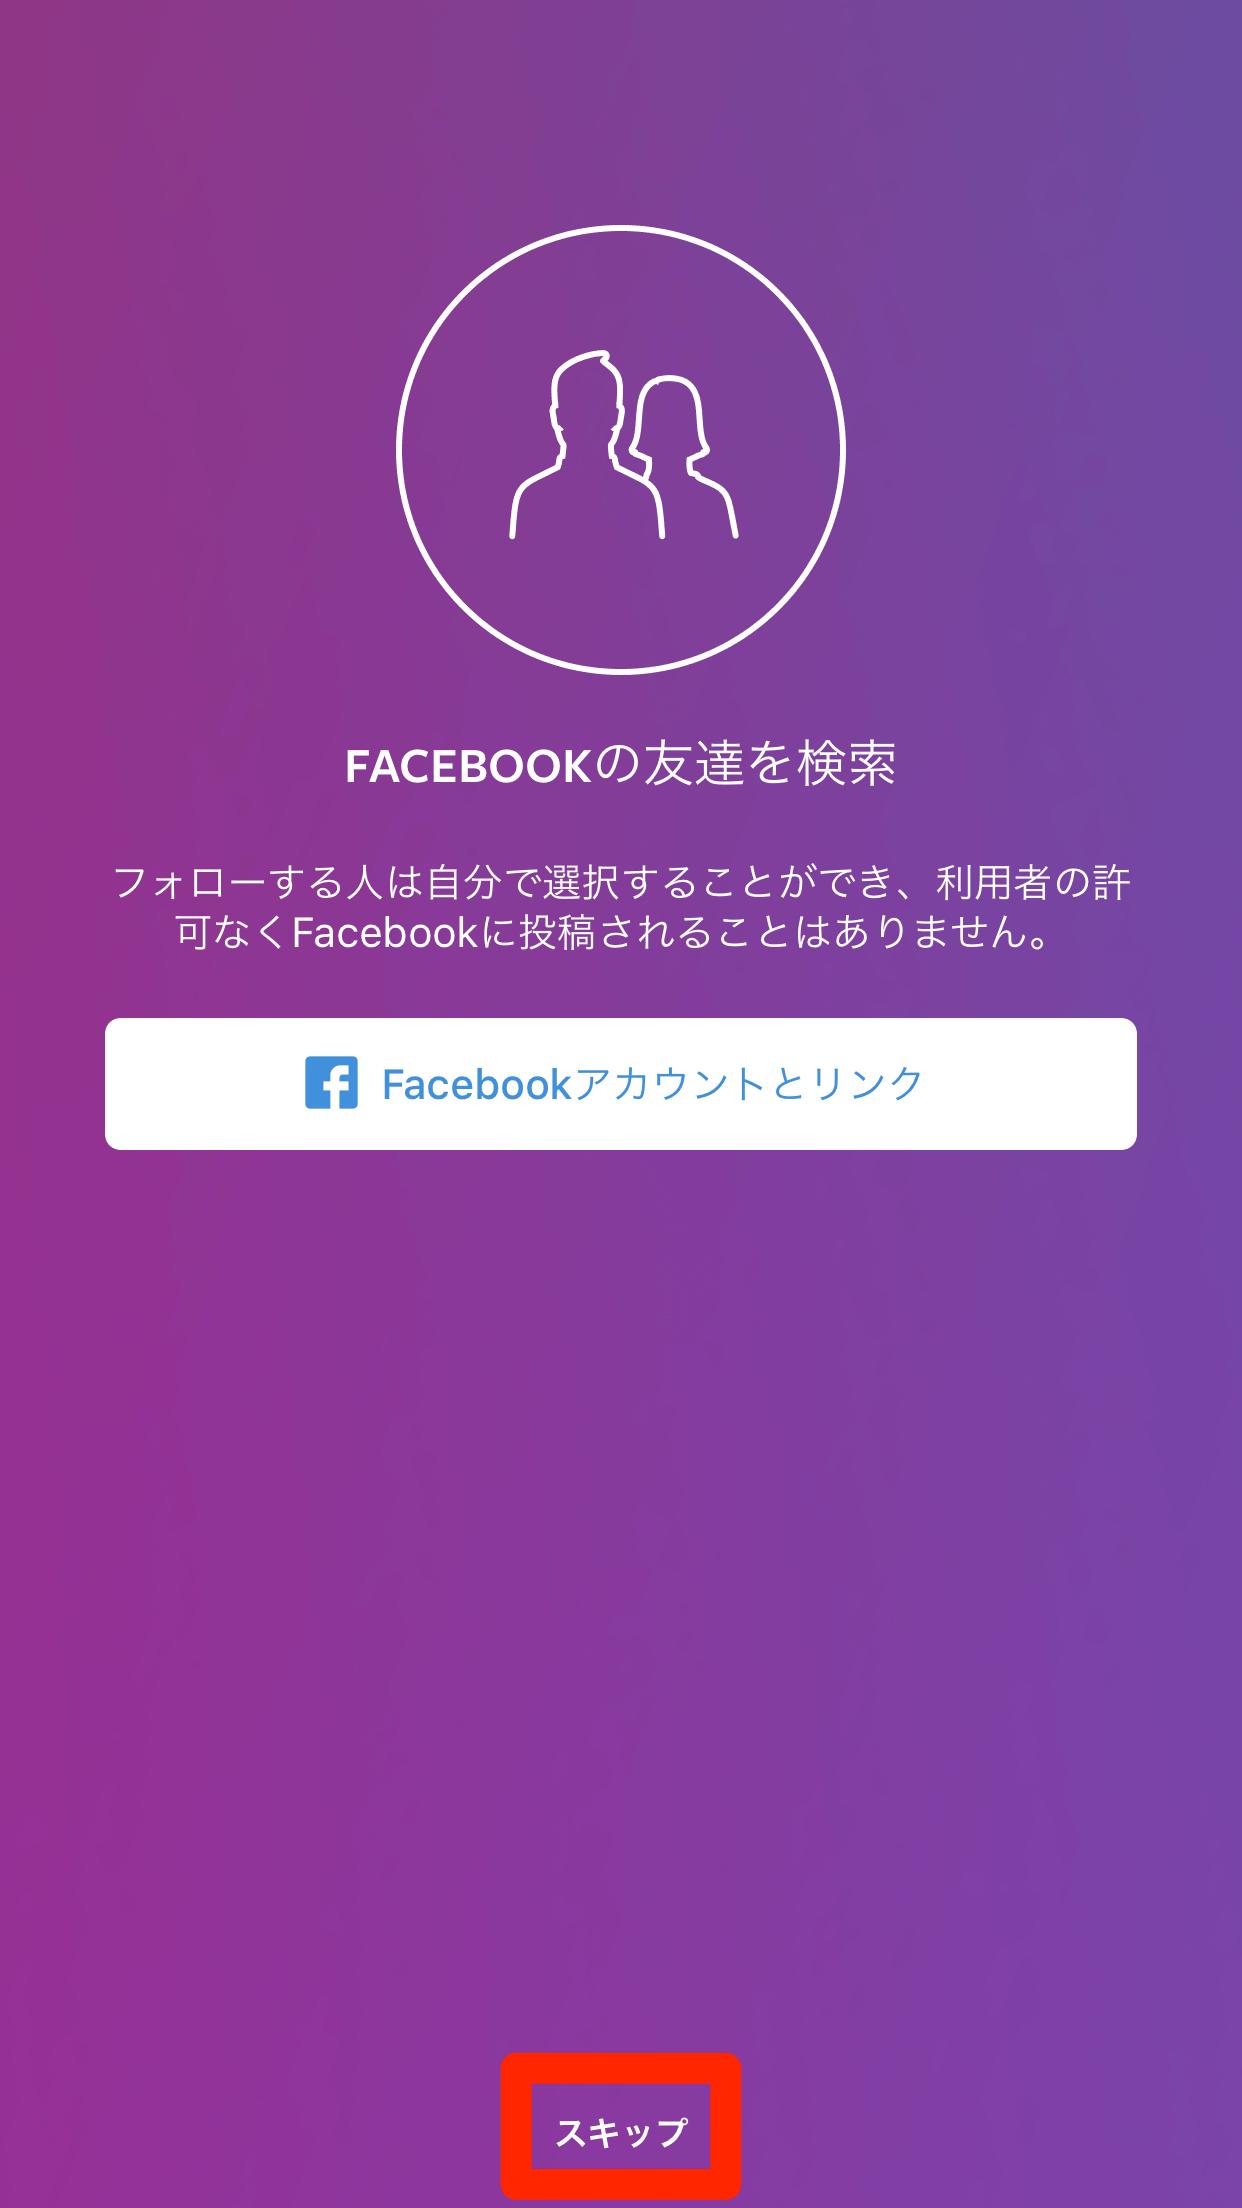 Facebookとのリンクを設定する